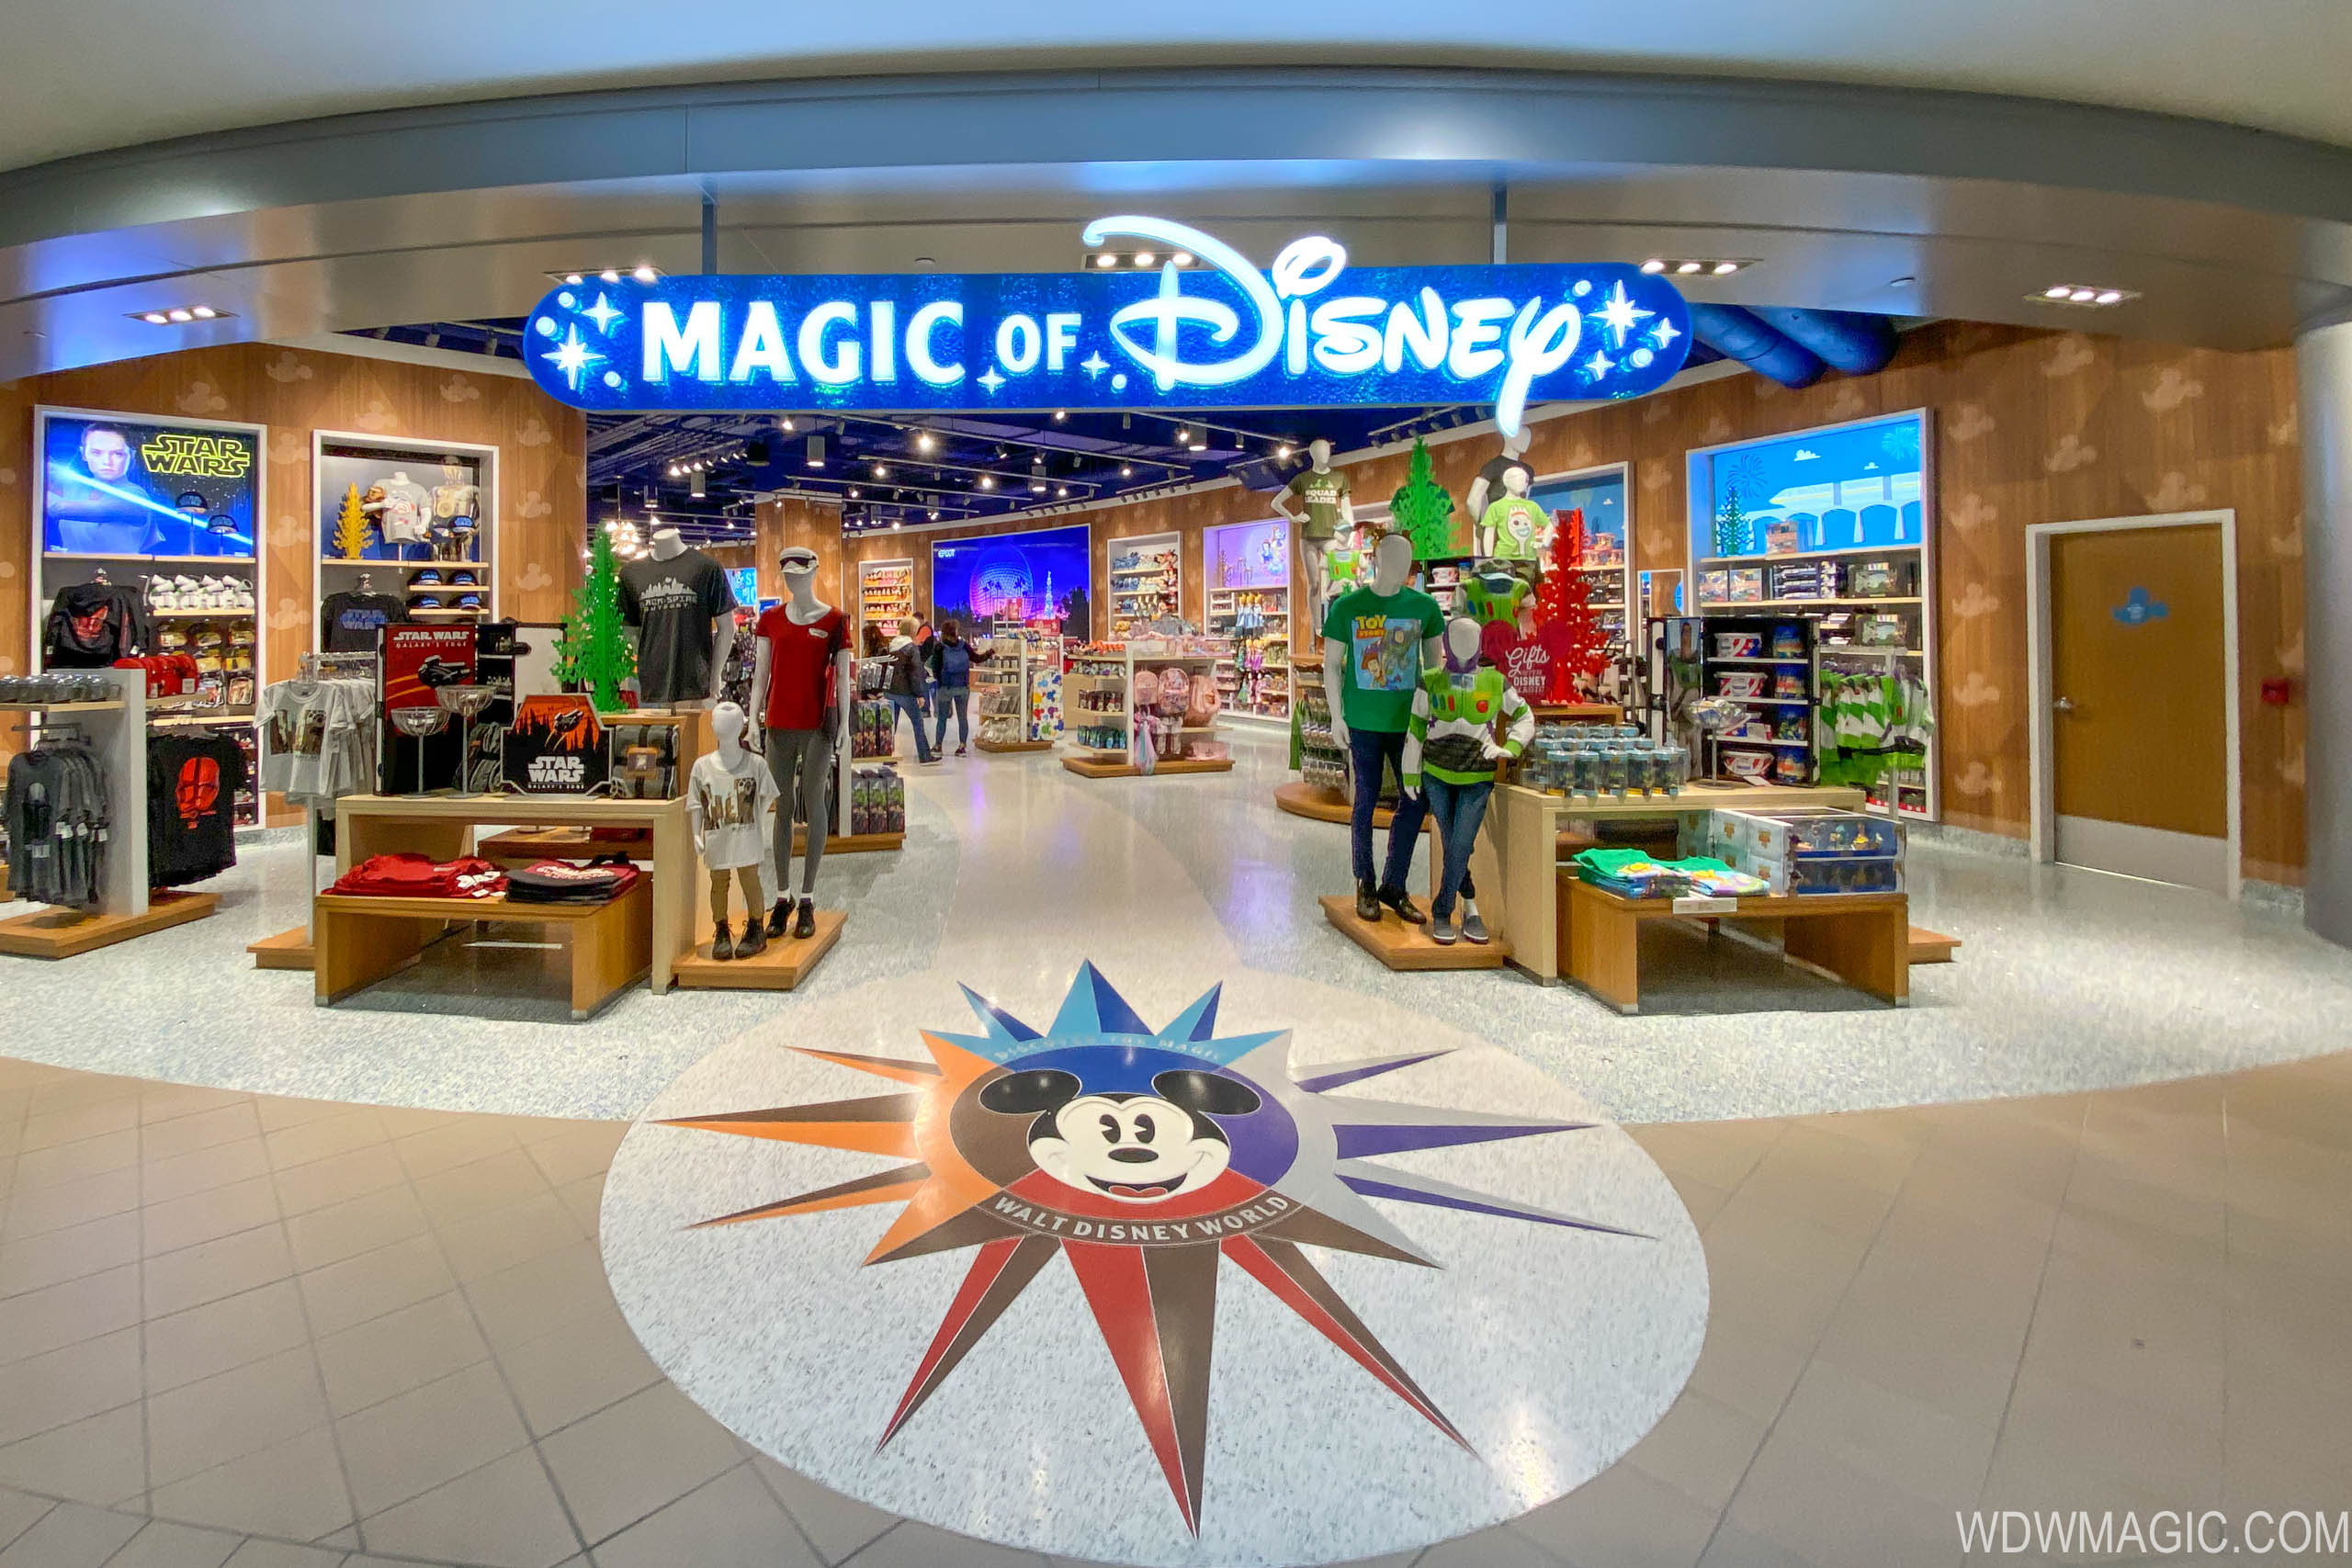 The Magic of Disney Store at Orlando International Airport